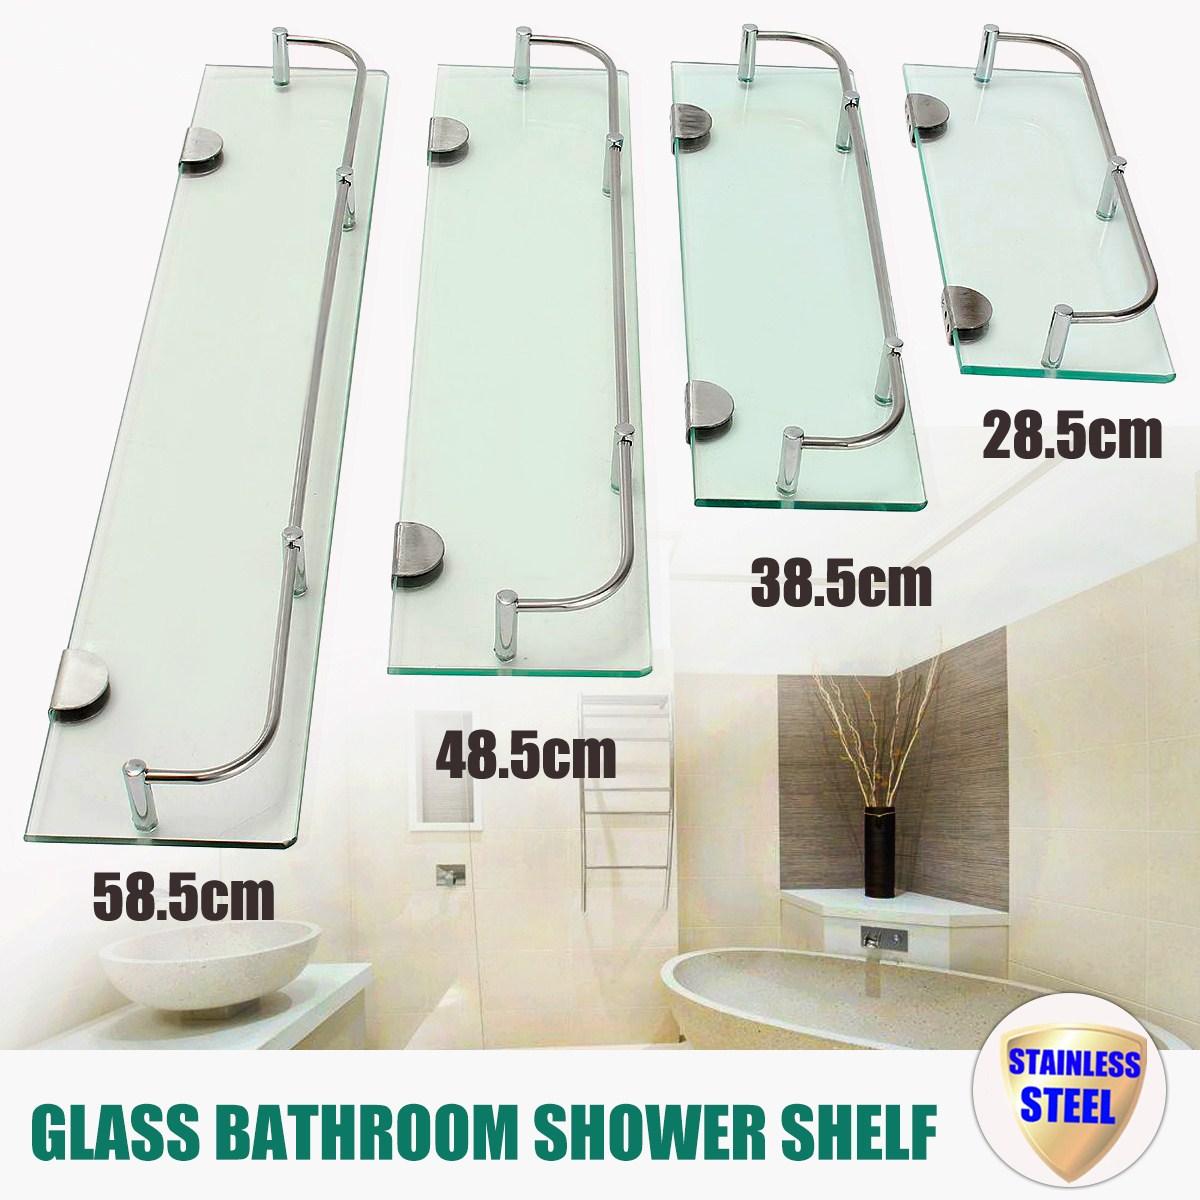 Glass Shower Shelf Bathroom Rack Organizer Holder Rectangle Tier Bathroom Hardware Shampo Mirror Front Rack Wall Mount Shelf